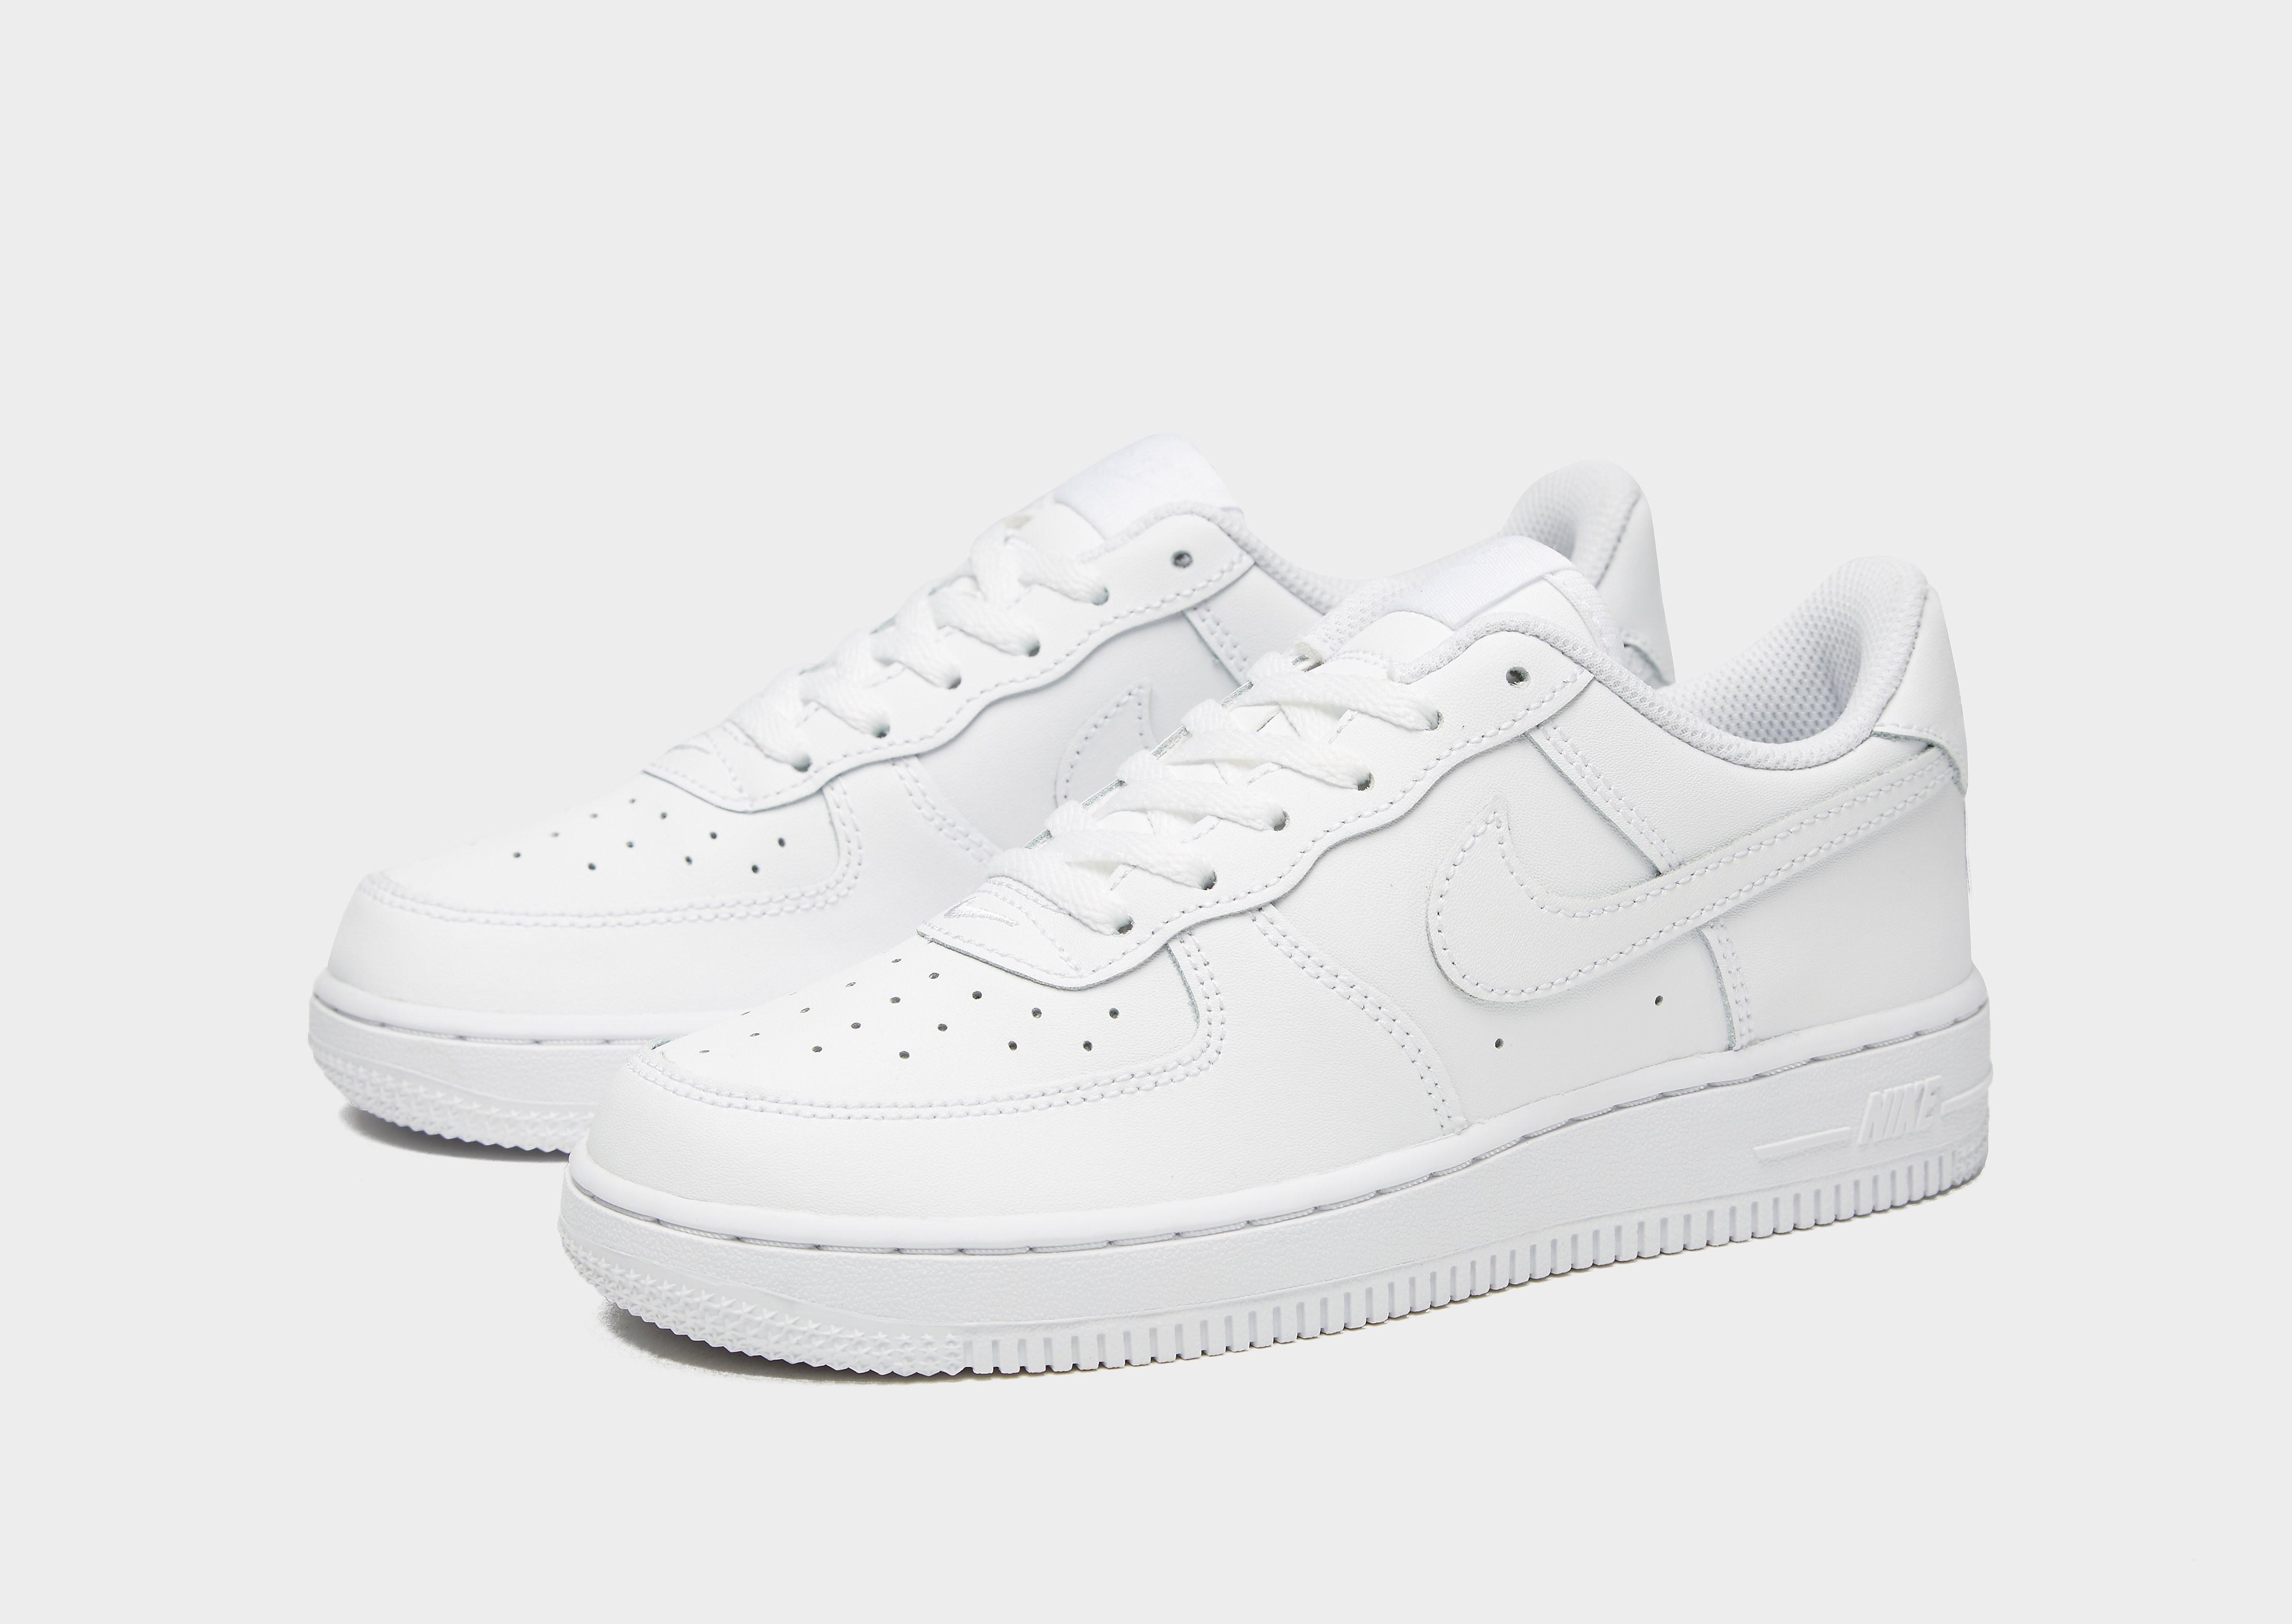 Nike Air Force 1 für Kinder